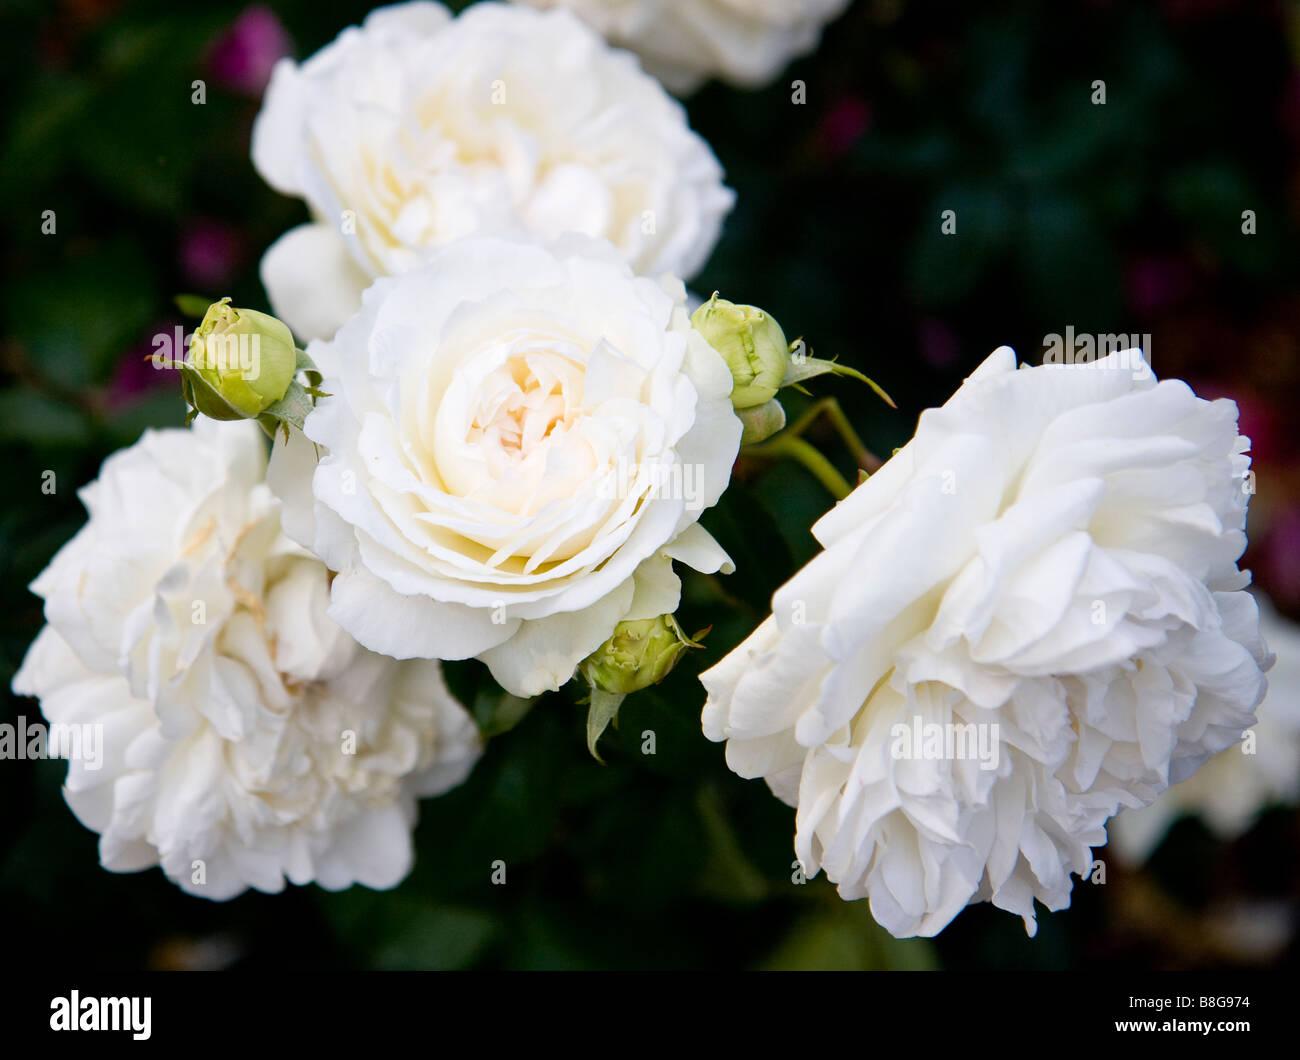 Rose bianche da Portland Rose Garden Immagini Stock